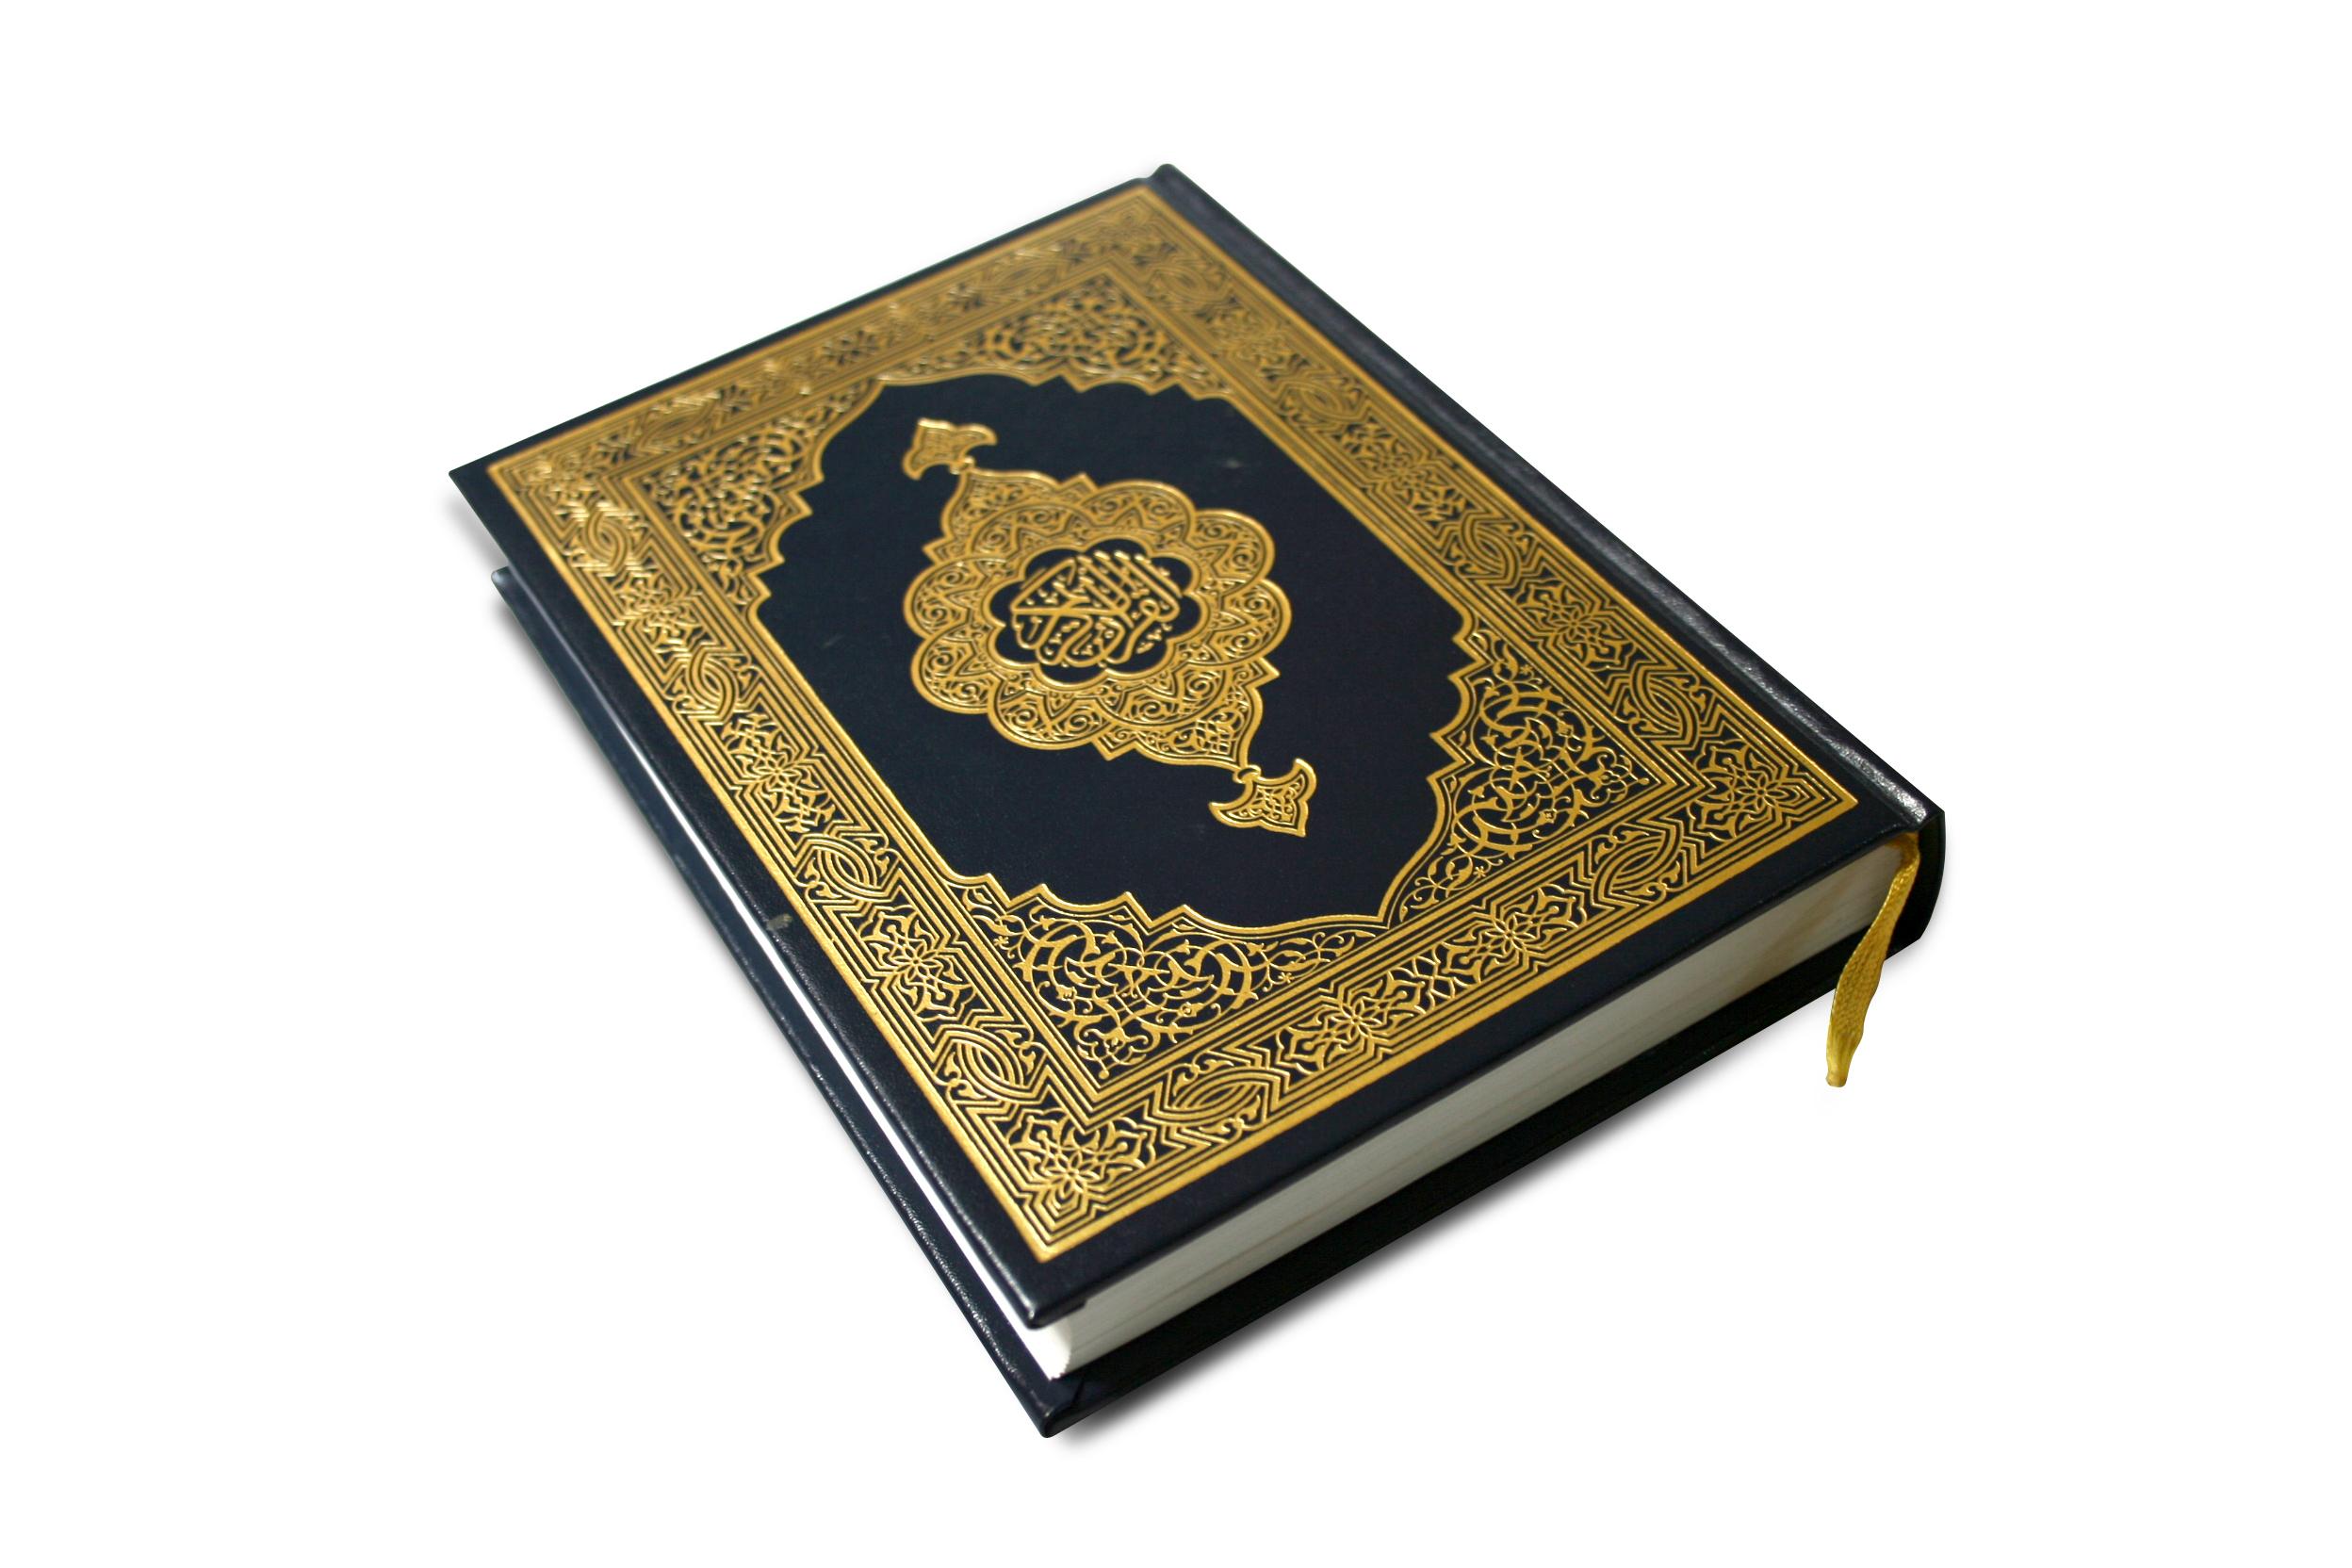 Quran hq صور المصحف الشريف - صور القران الكريم